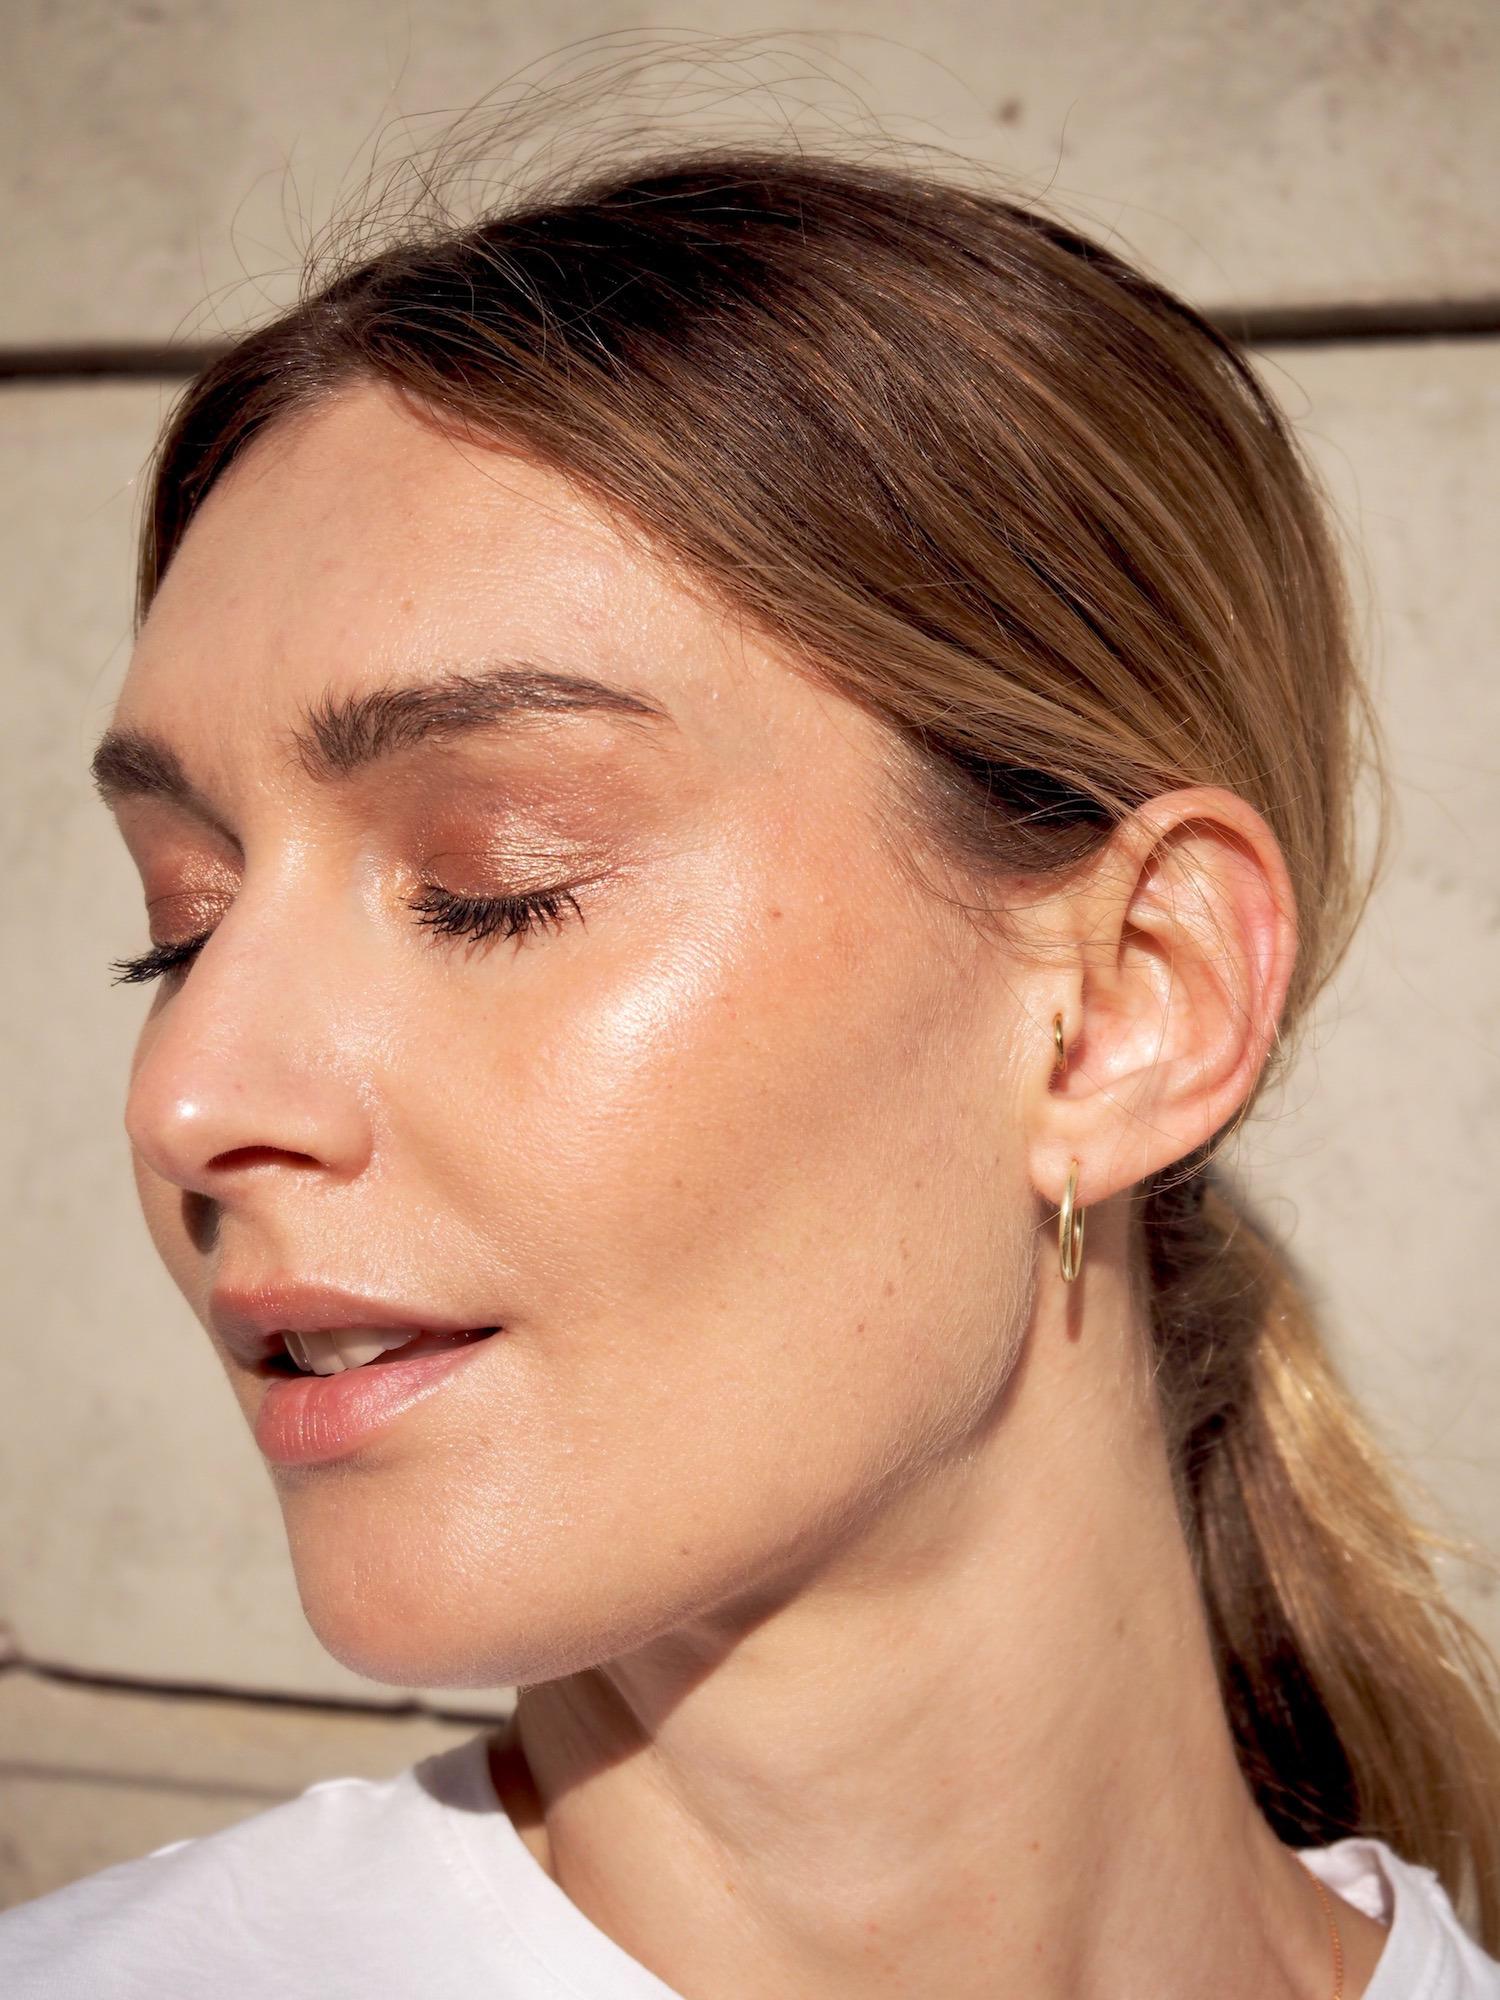 Blogazine Beautyblog Beautyblogger Beauty Blog BAREMINDS Elina Neumann Glowy Skin Gesunde pralle Haut 3.1